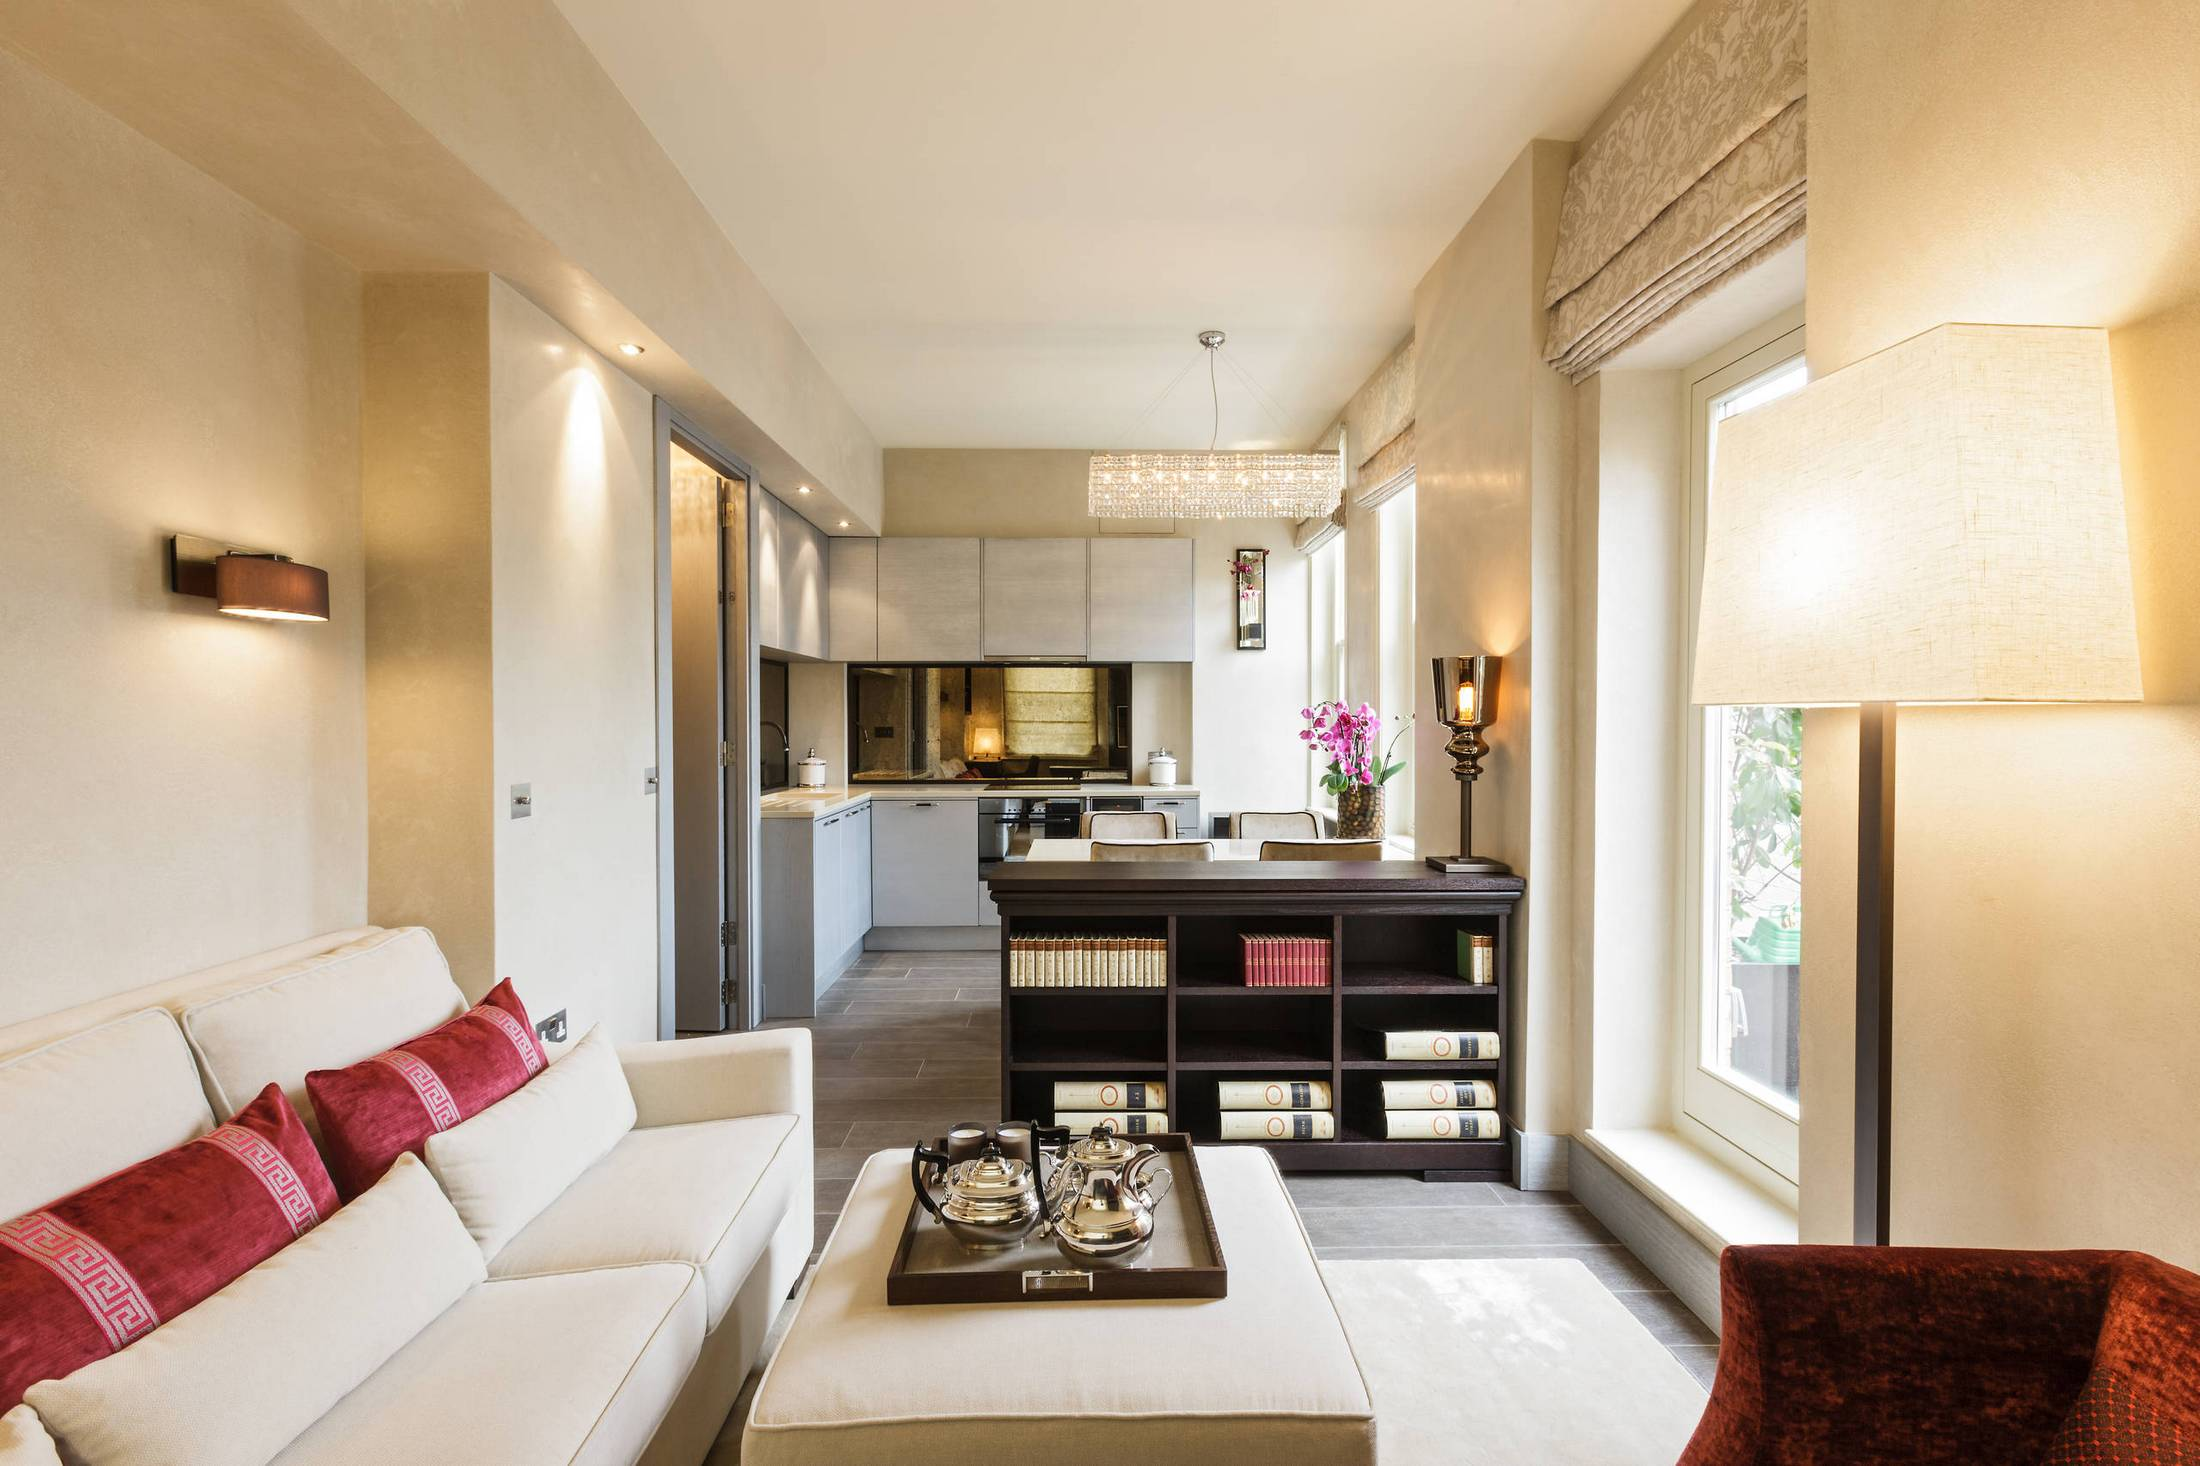 Однокомнатная квартира 40 кв м с французскими окнами